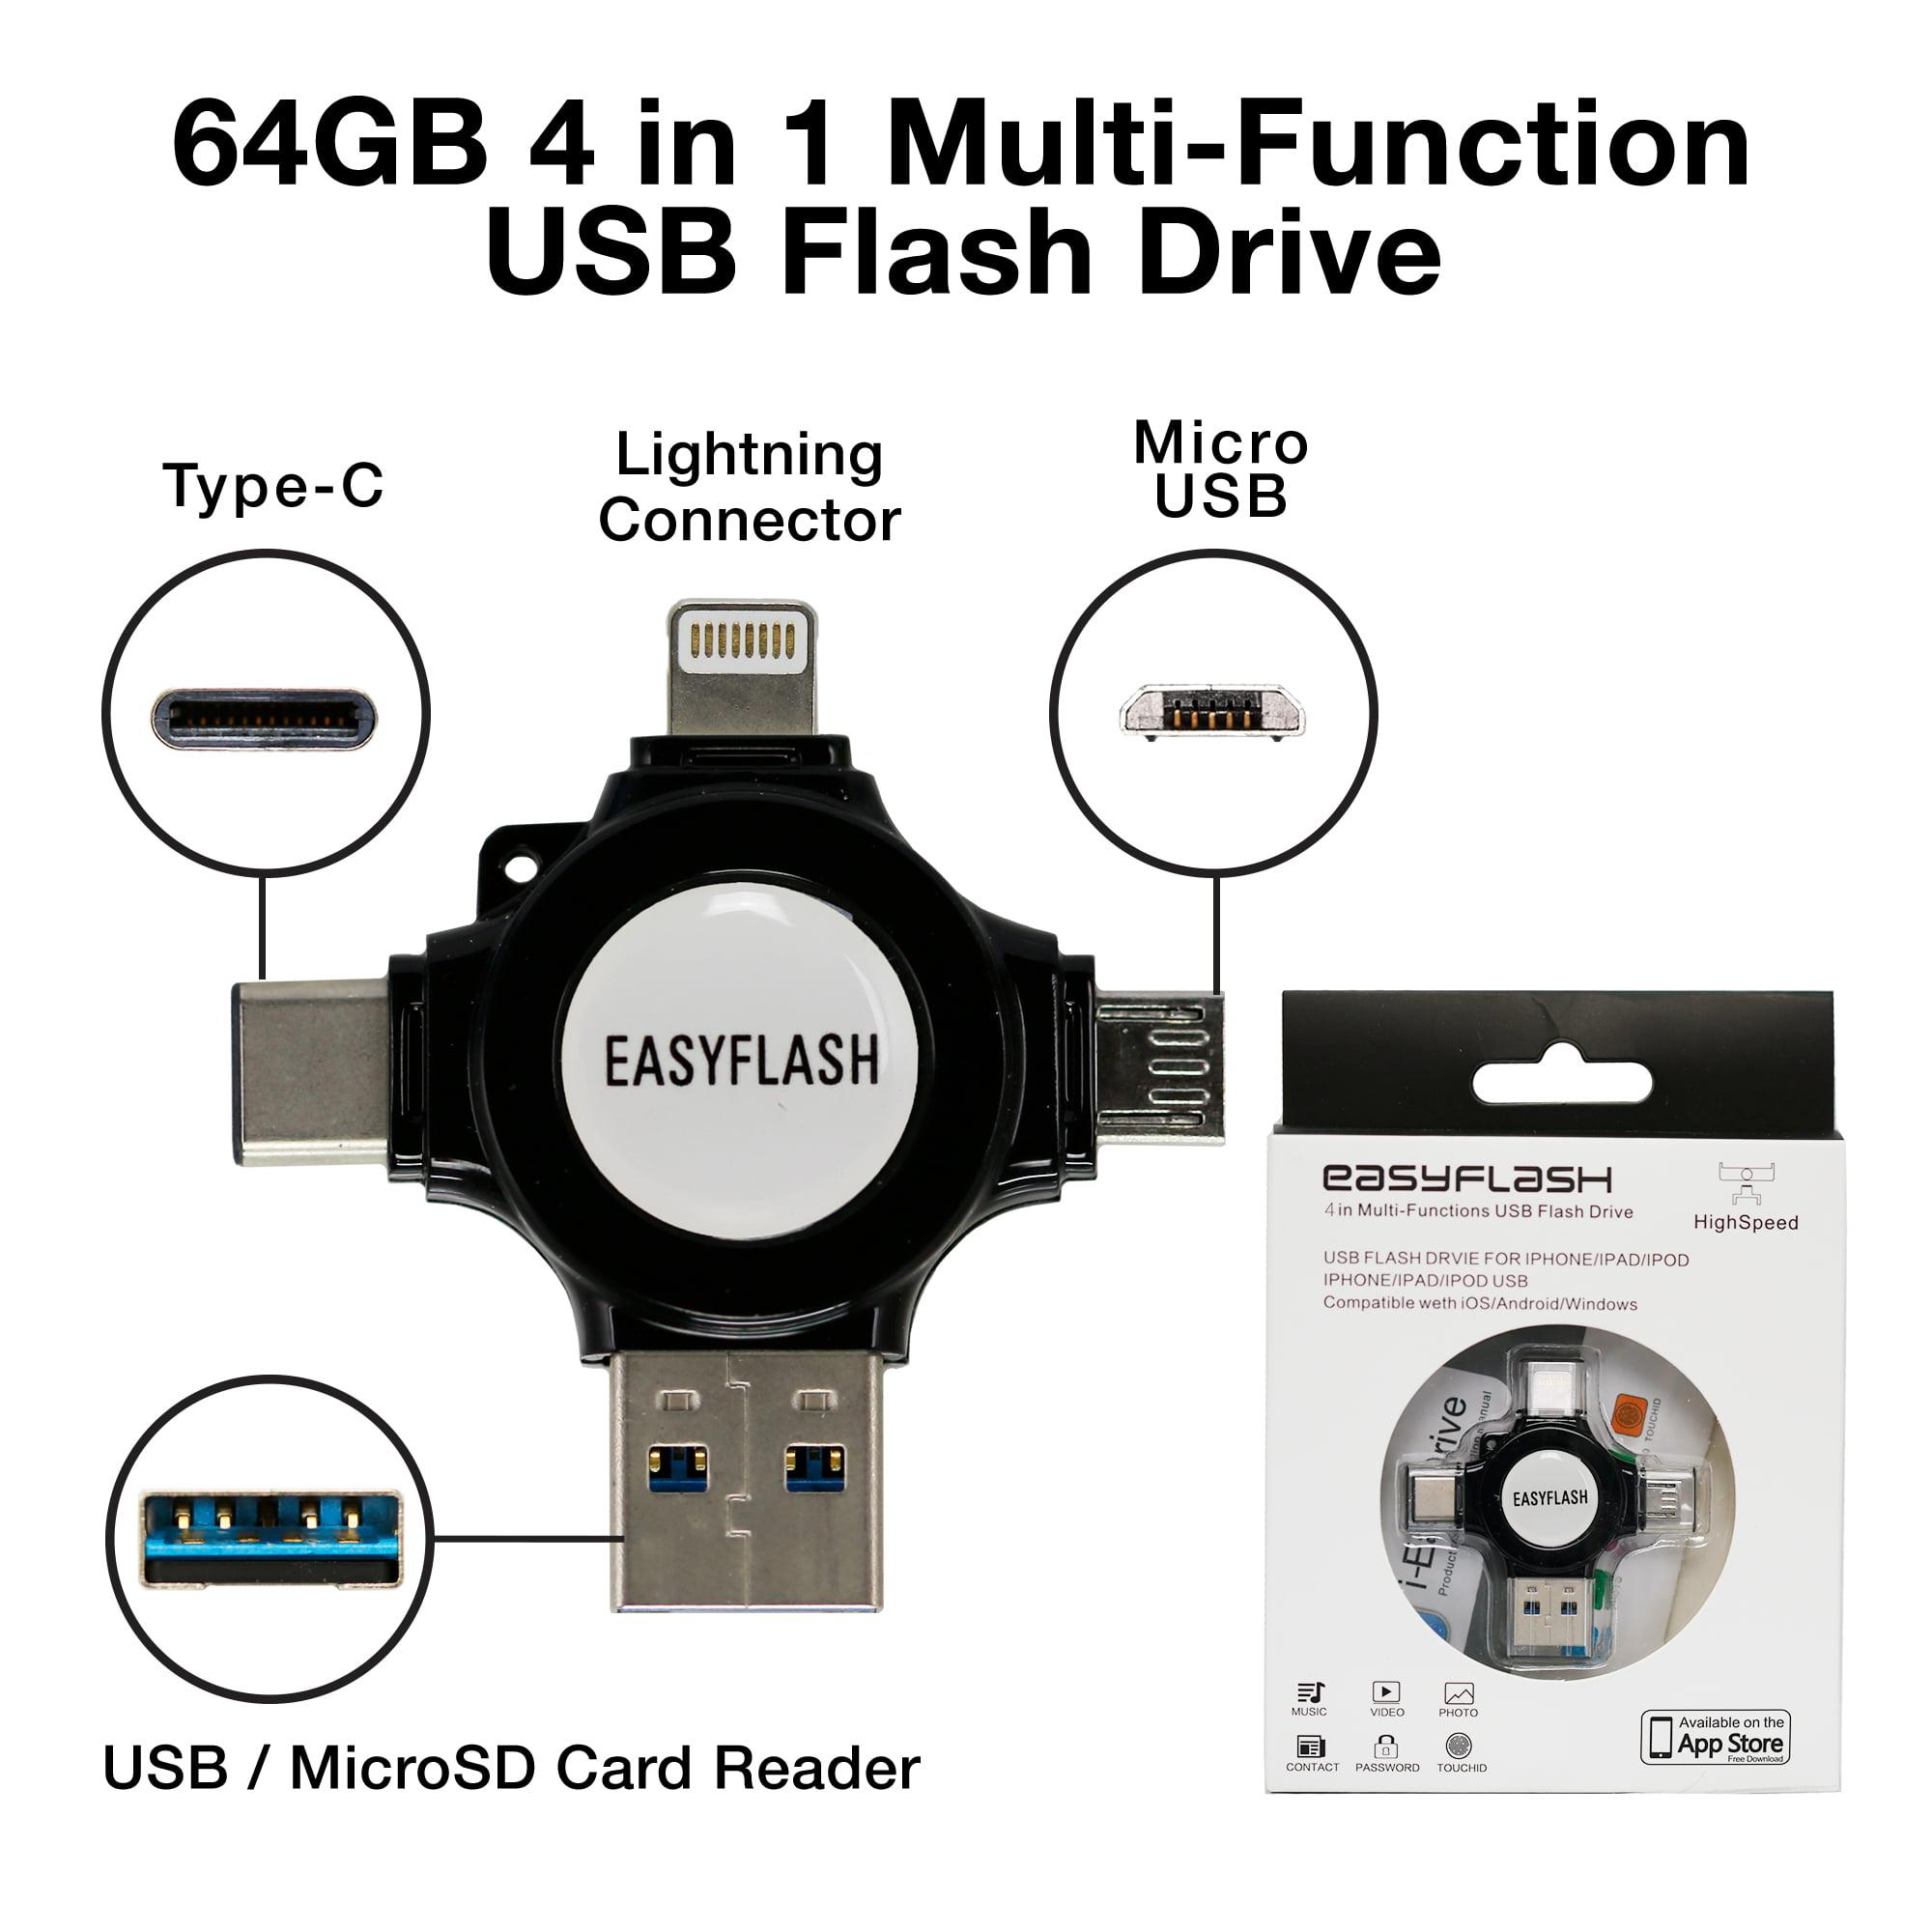 4in1 (Type C & Lightning & MicroUSB & USB3.0/MicroSD Card Reader) Multi-Function USB Flash Drive - (64GB) Black